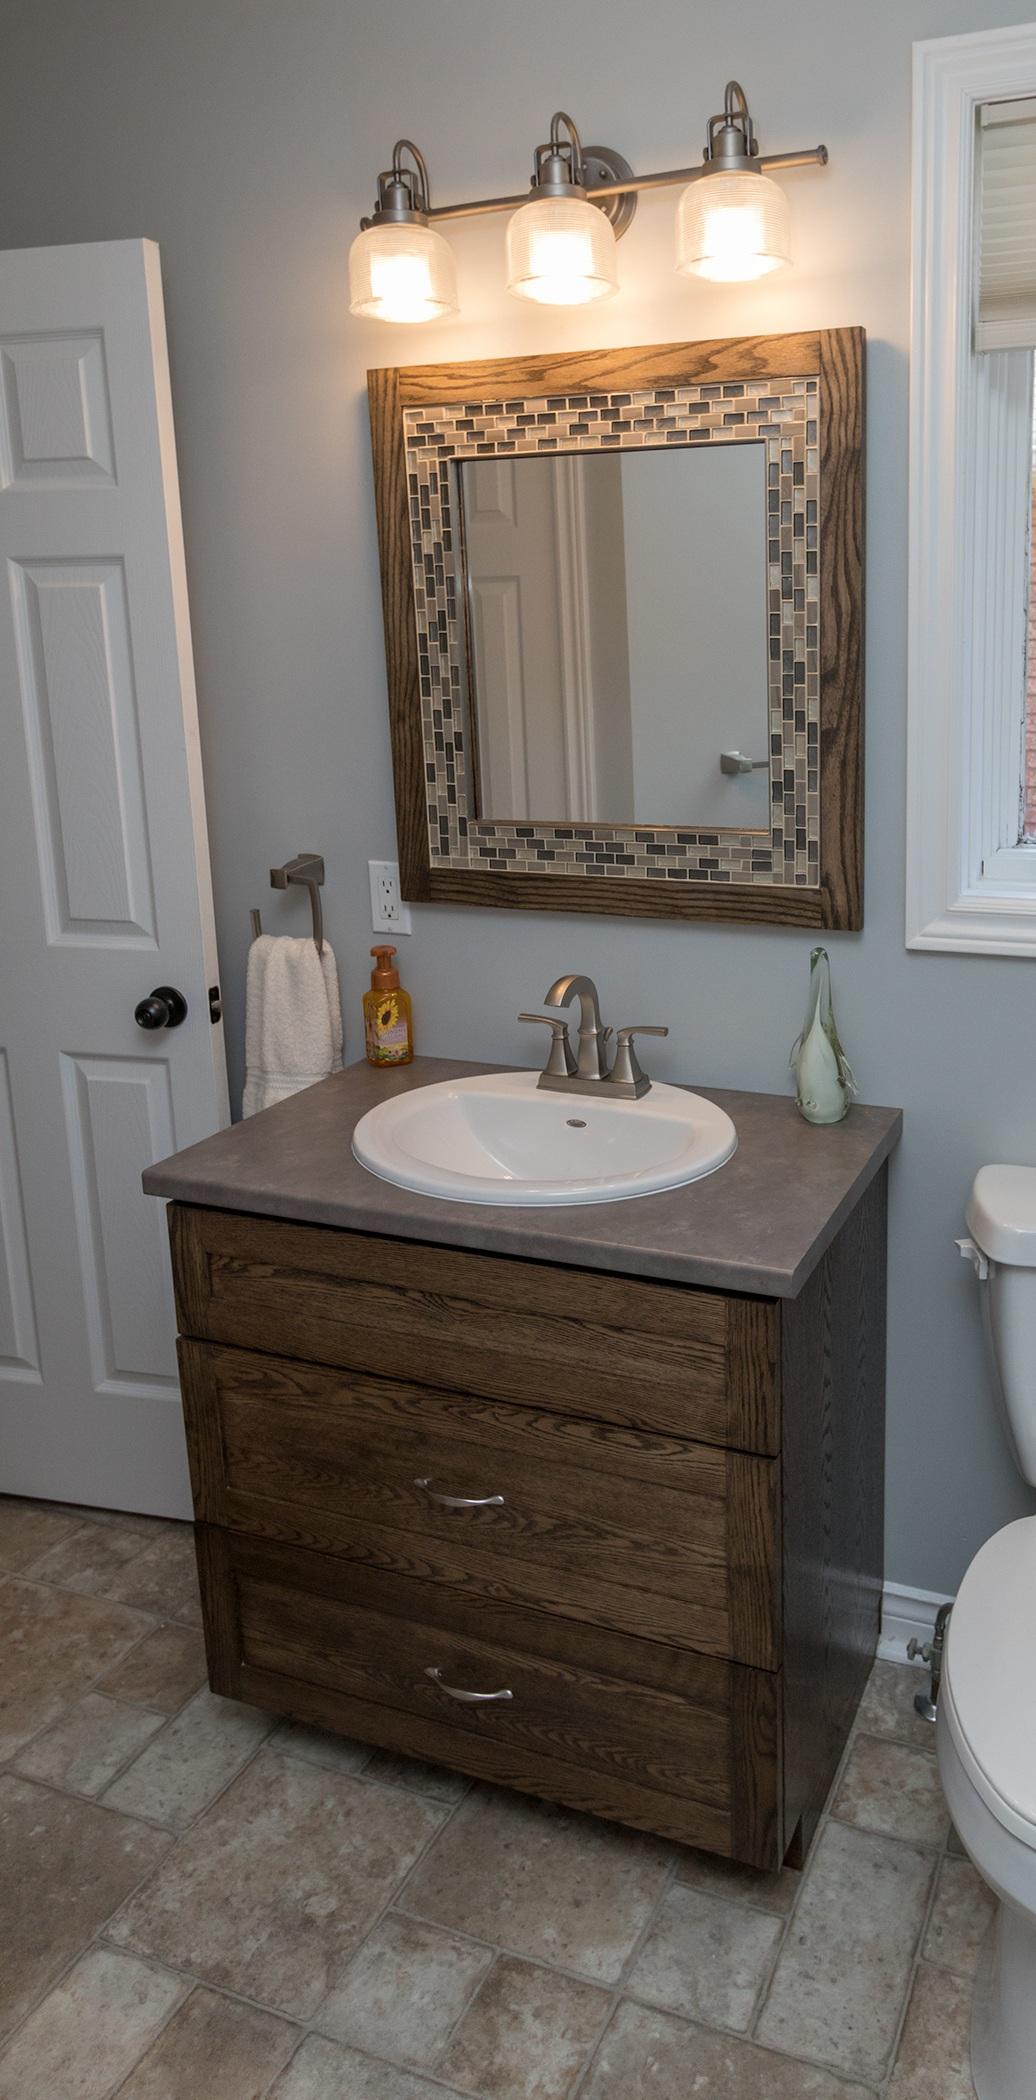 33-Wabbakish-bath-room-1+-+Copy+-+Copy.jpg